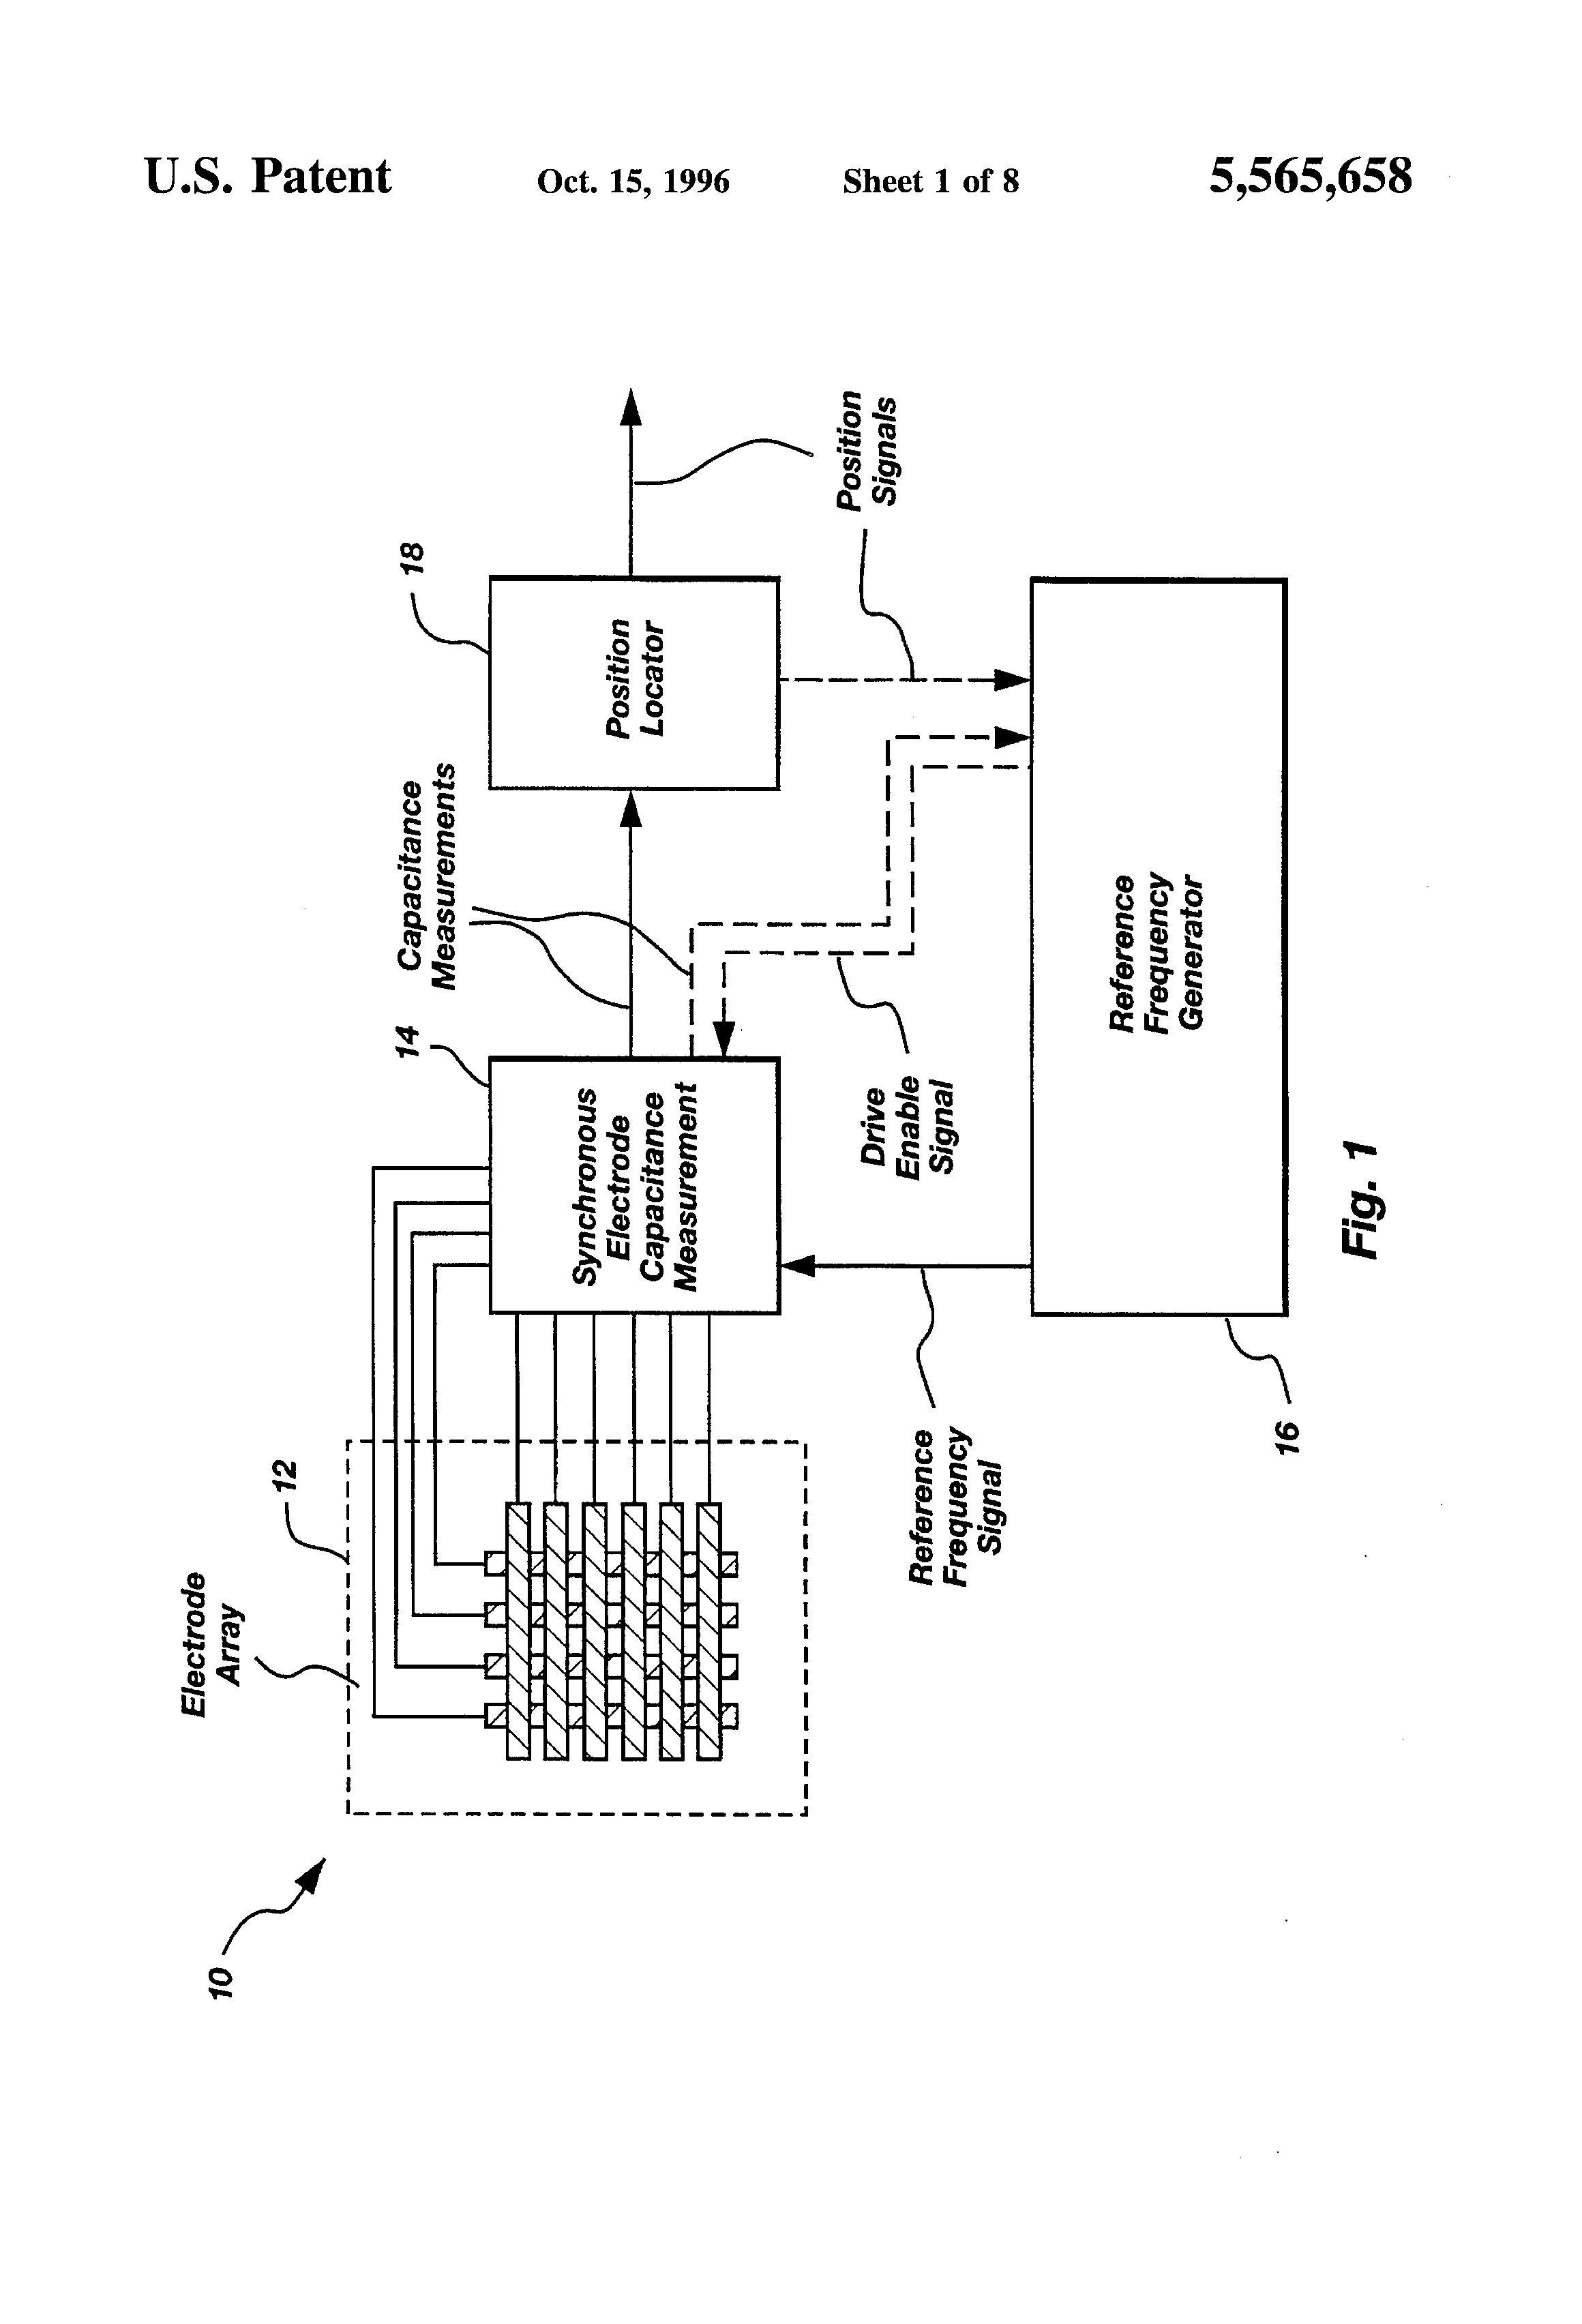 D16Z6 Distributor Wiring Diagram Simple Alternator Wiring Diagram - Simple Alternator Wiring Diagram